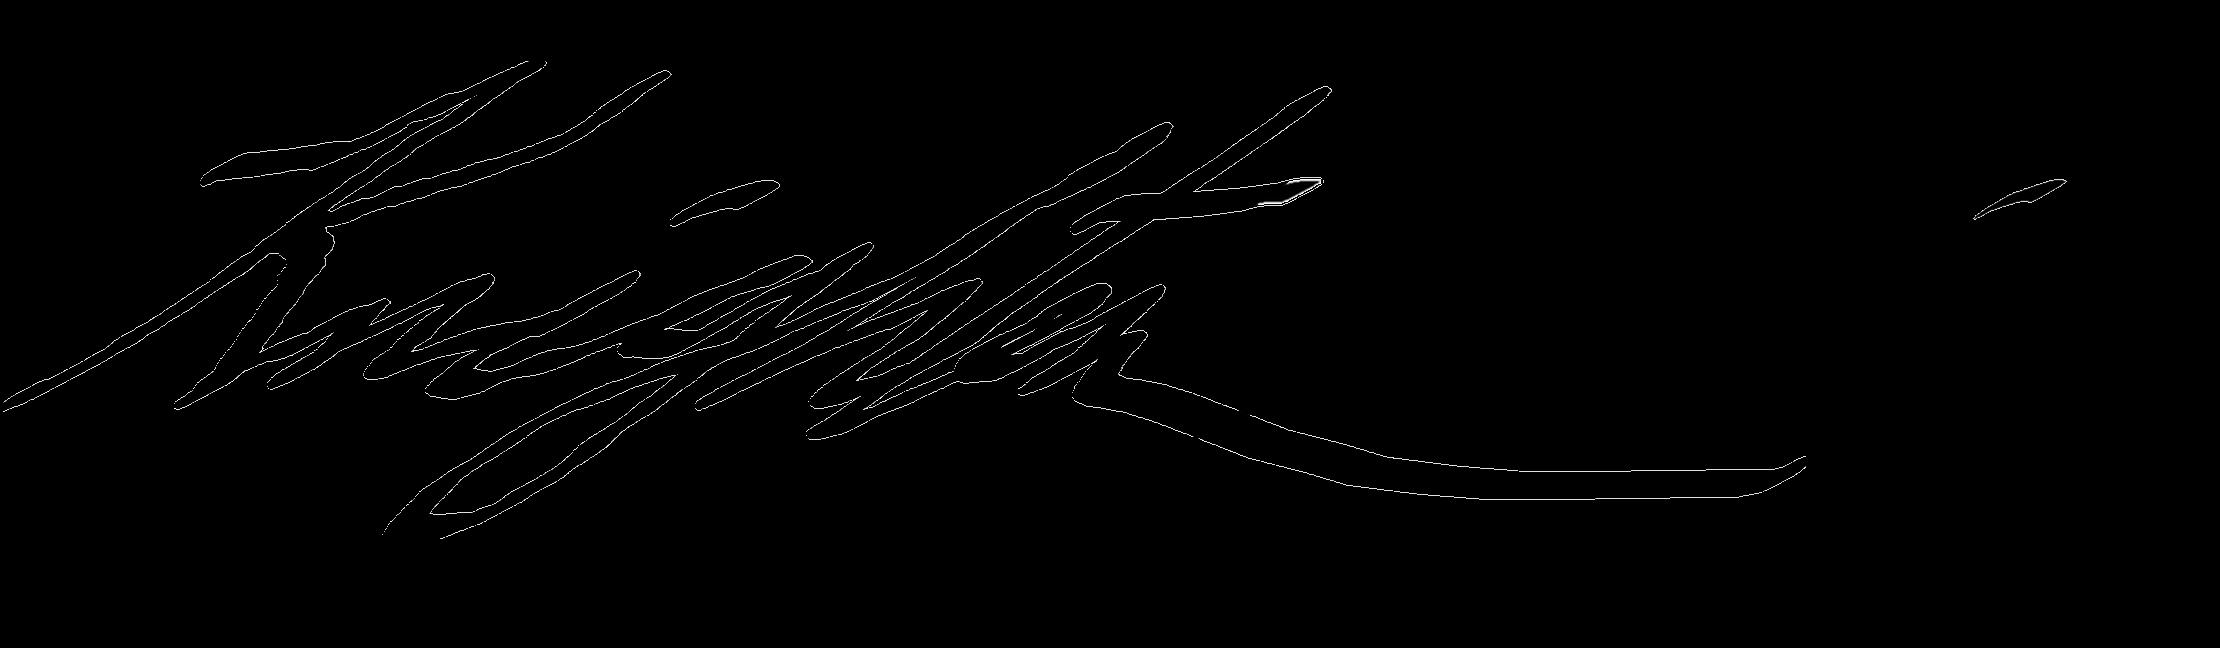 Knighten signature